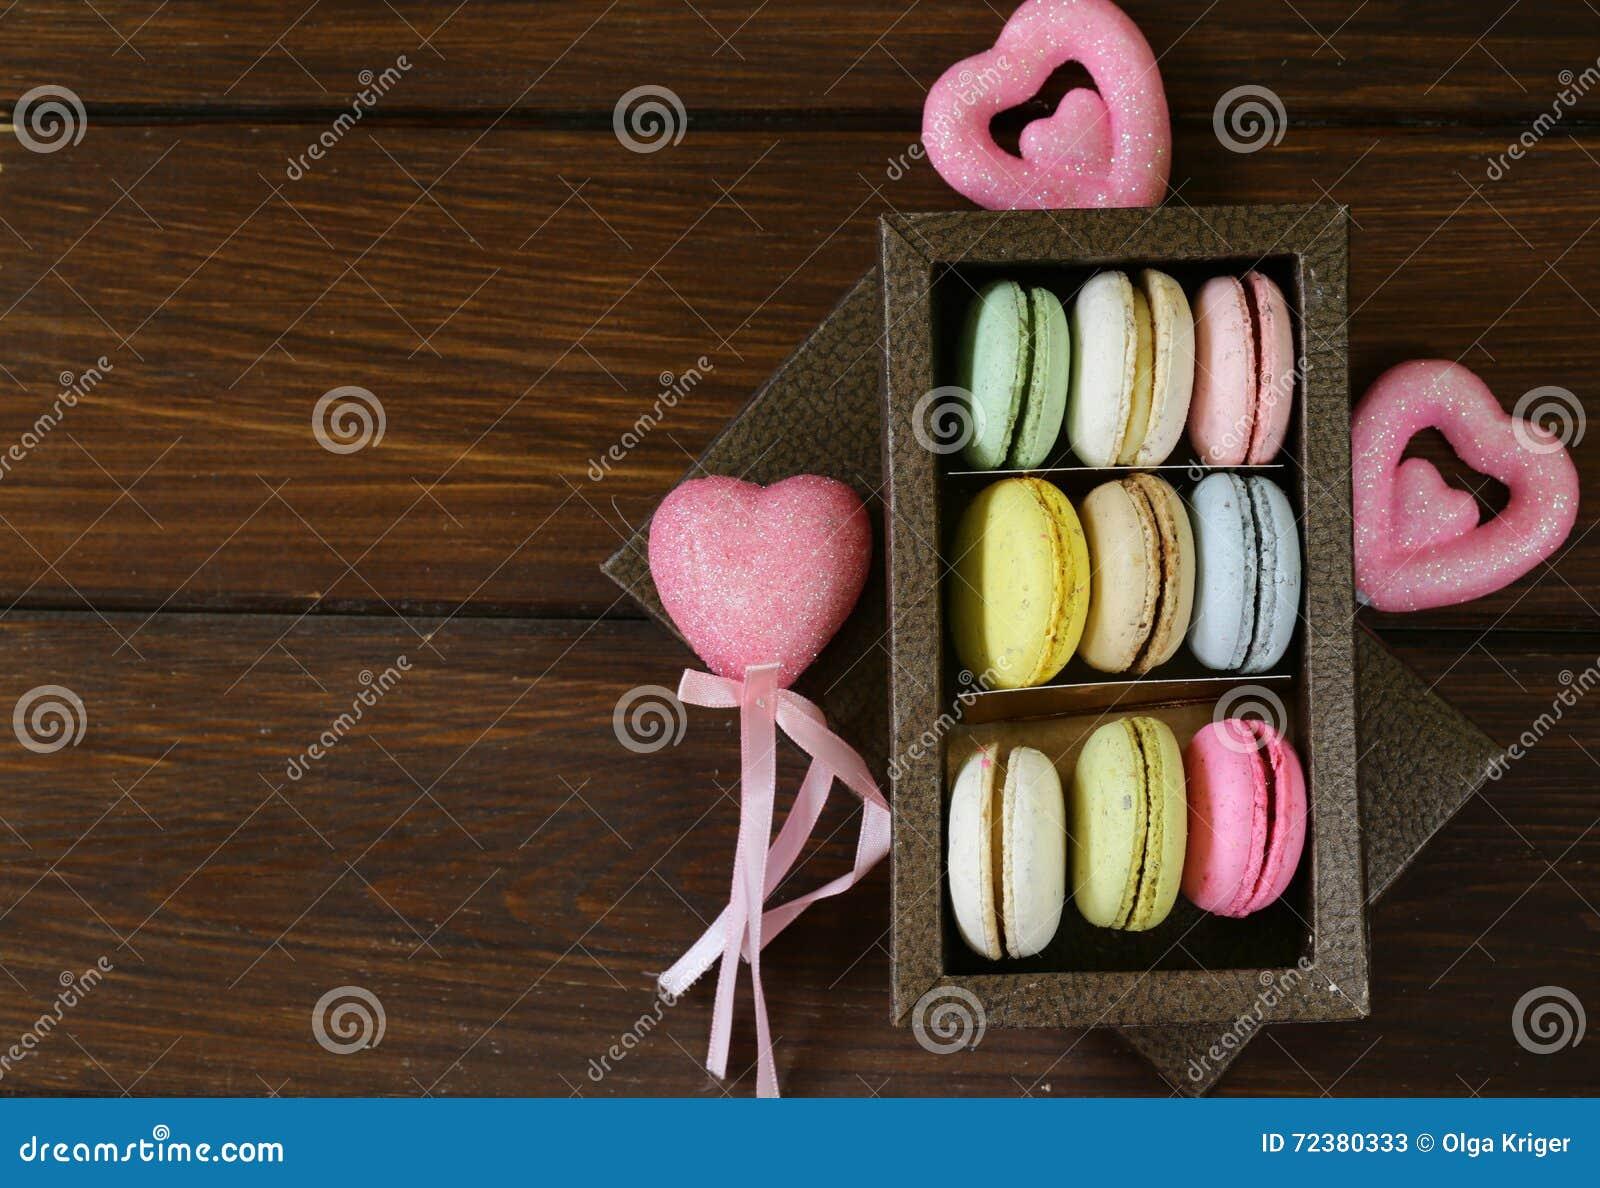 Multicolored Franse makarons van amandelkoekjes